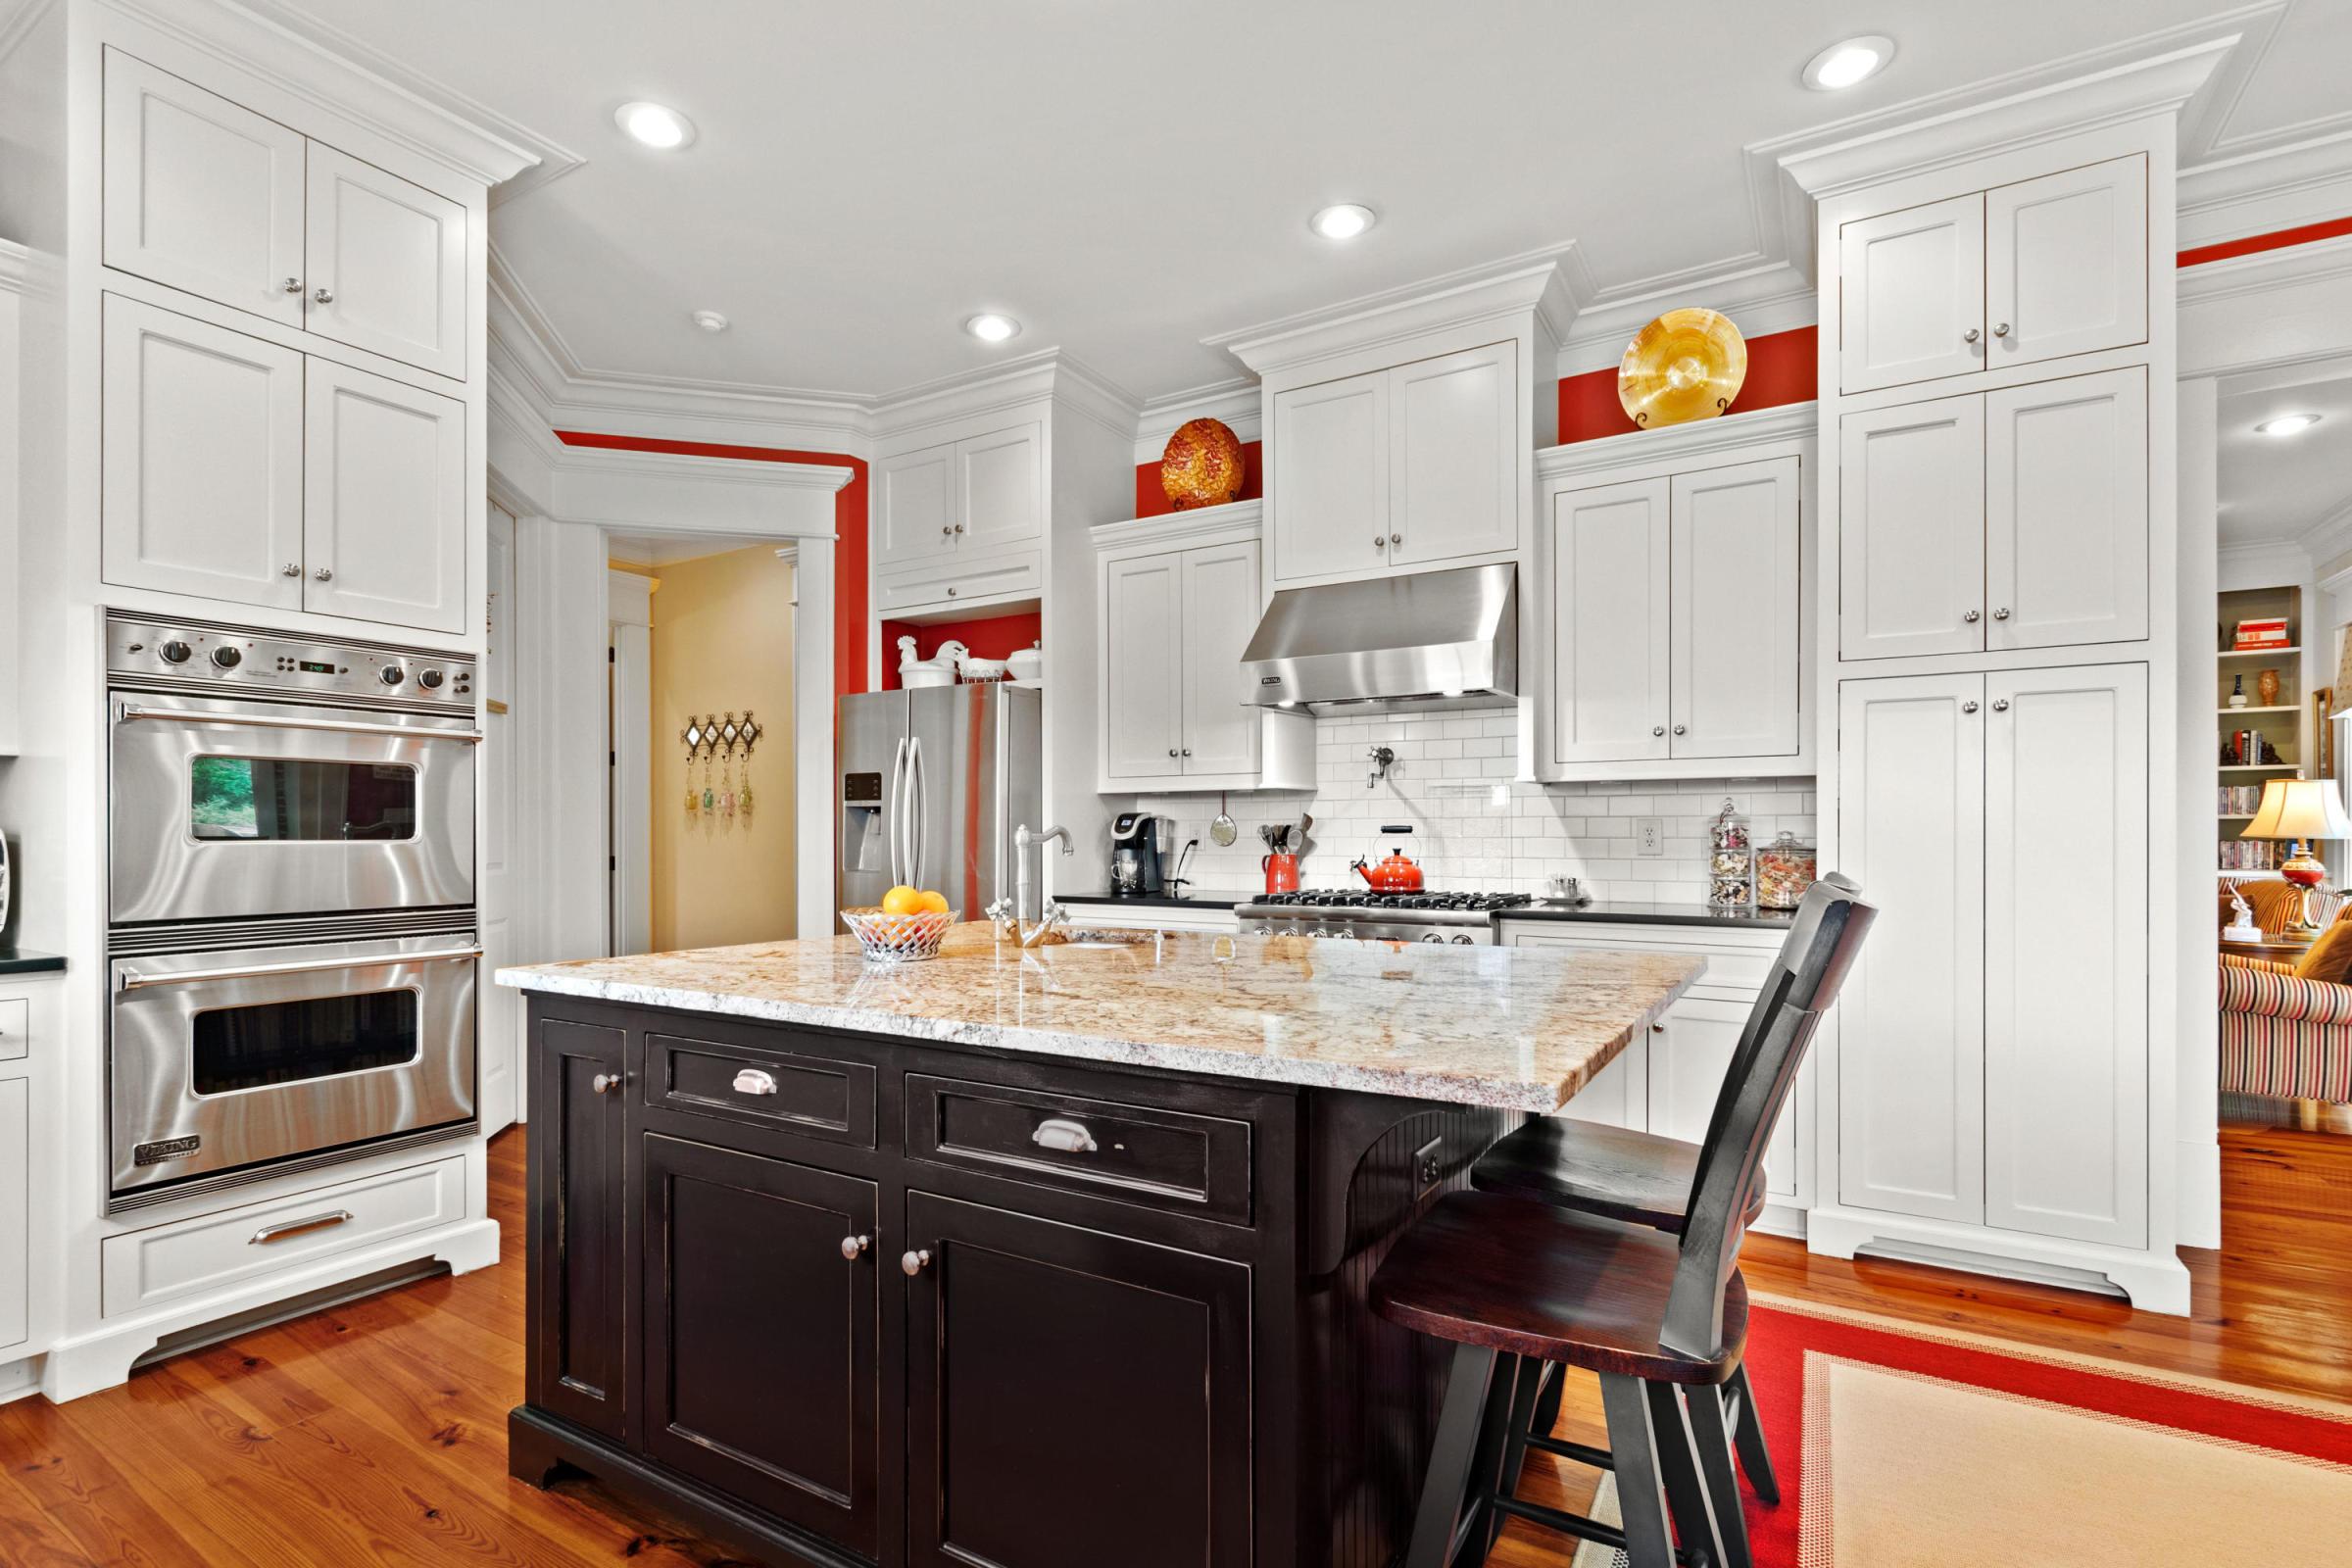 Broughton Hall Homes For Sale - 2058 Lakeshore, Pinopolis, SC - 18